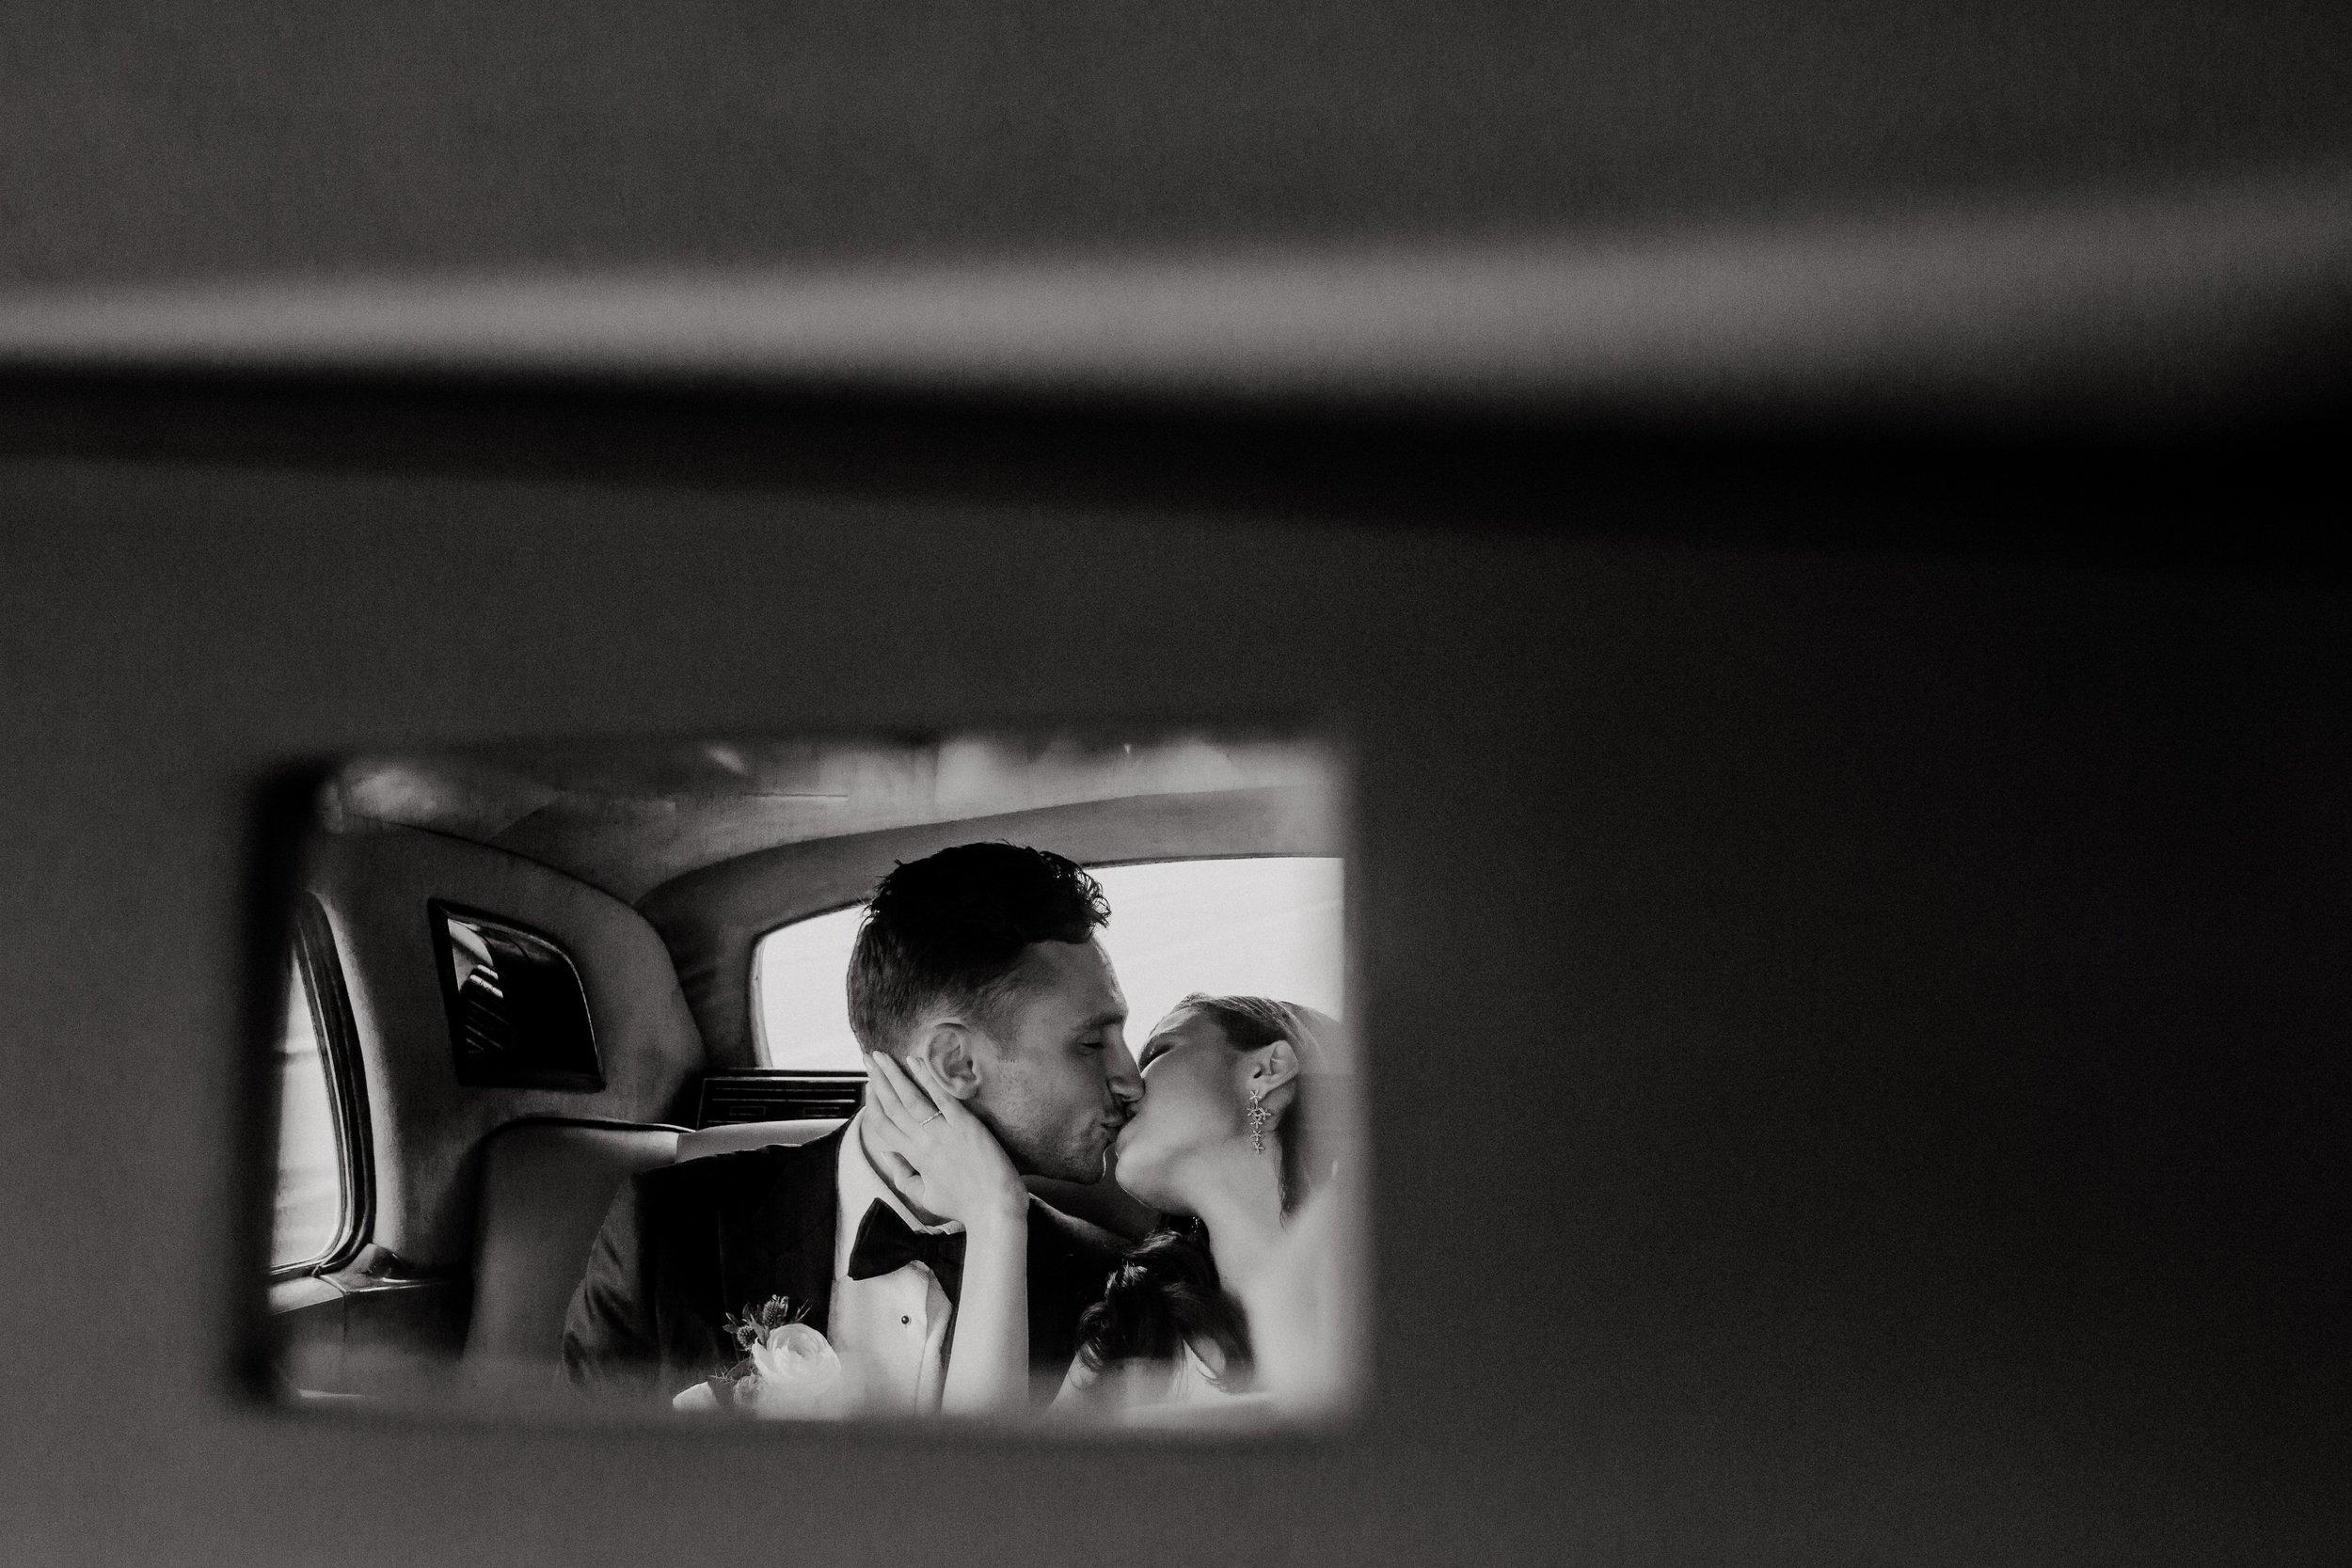 st-anthony-hotel-wedding-photography-10091san-antonio.JPG